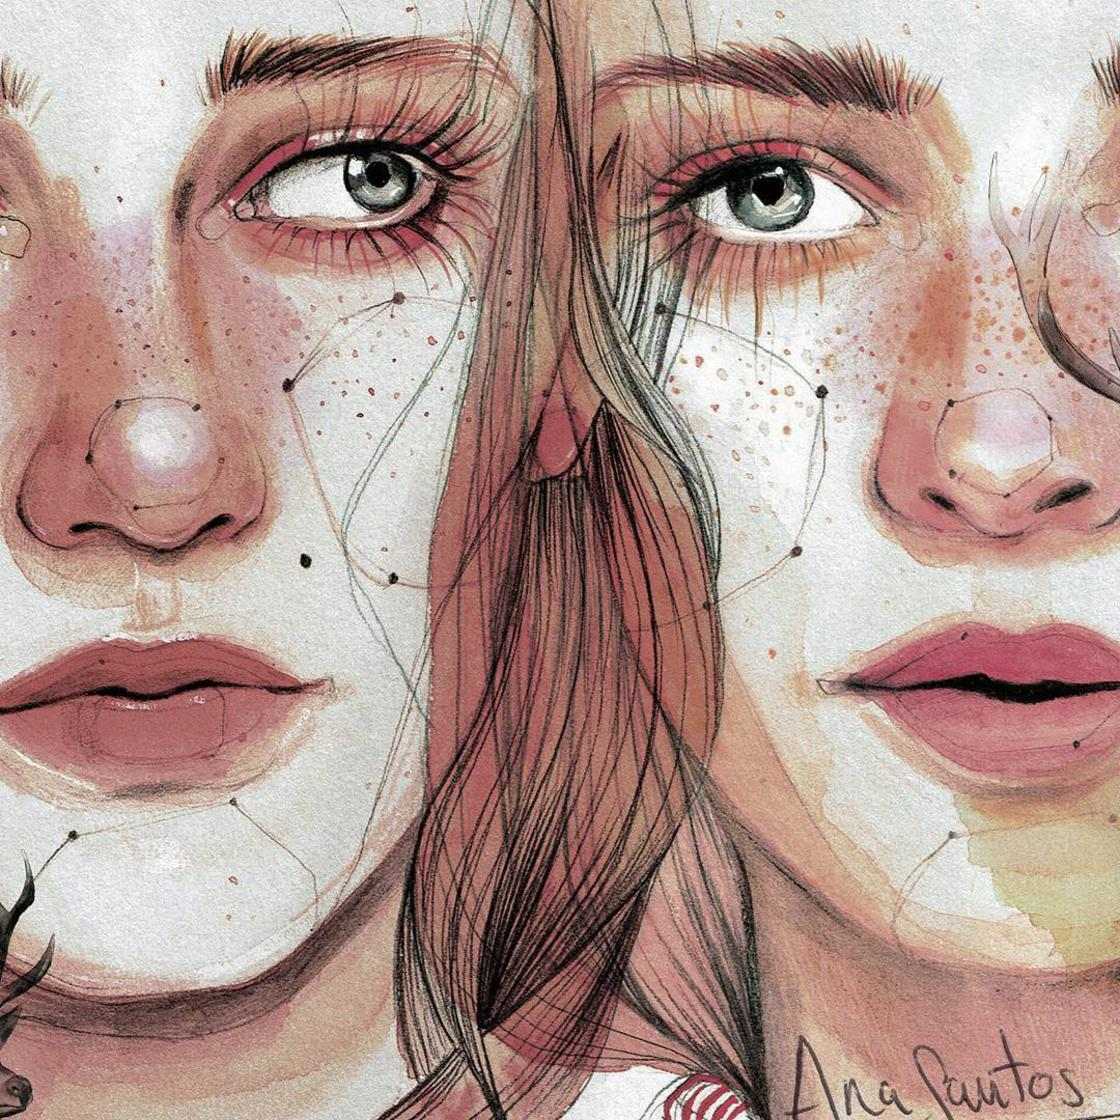 ana-santos-girl-portraits-16.jpg